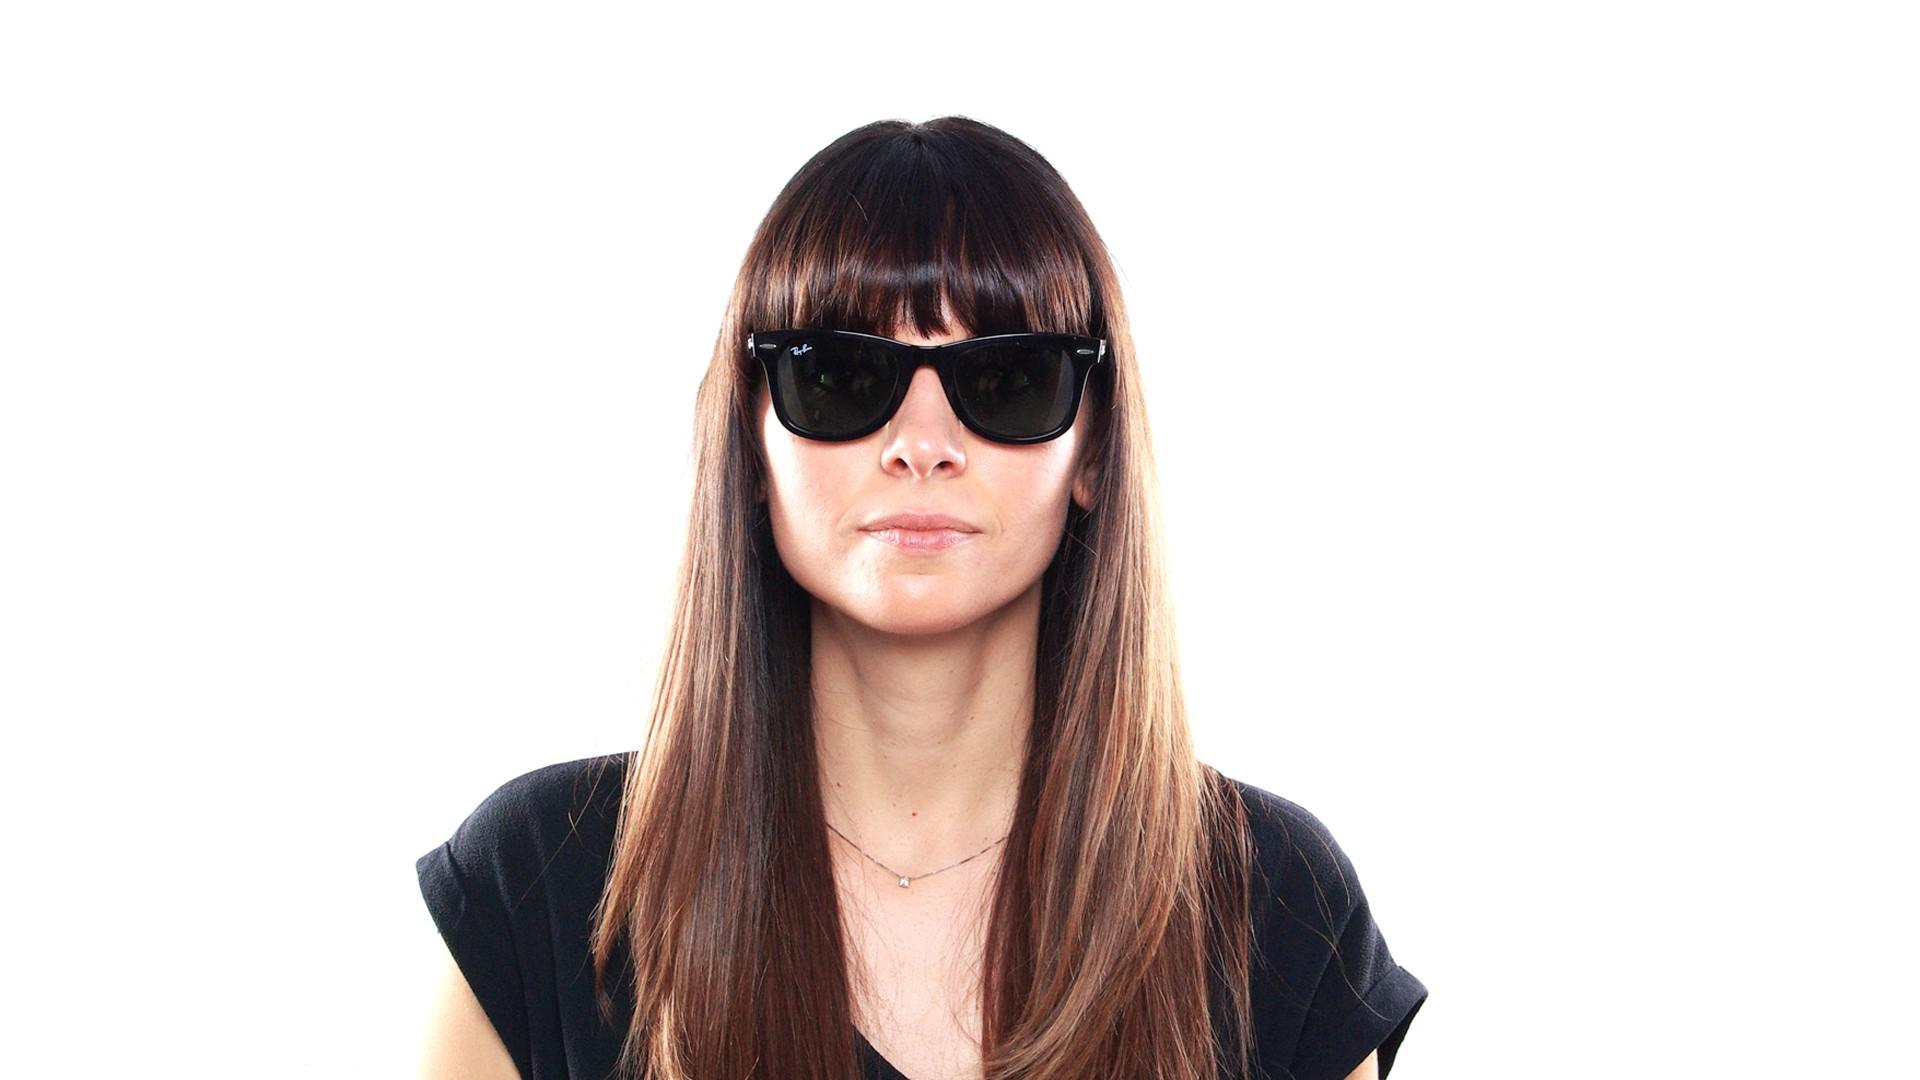 ad374016d Ray-Ban Wayfarer Ease Sunglasses Black RB4340 601 50-22 | Visiofactory